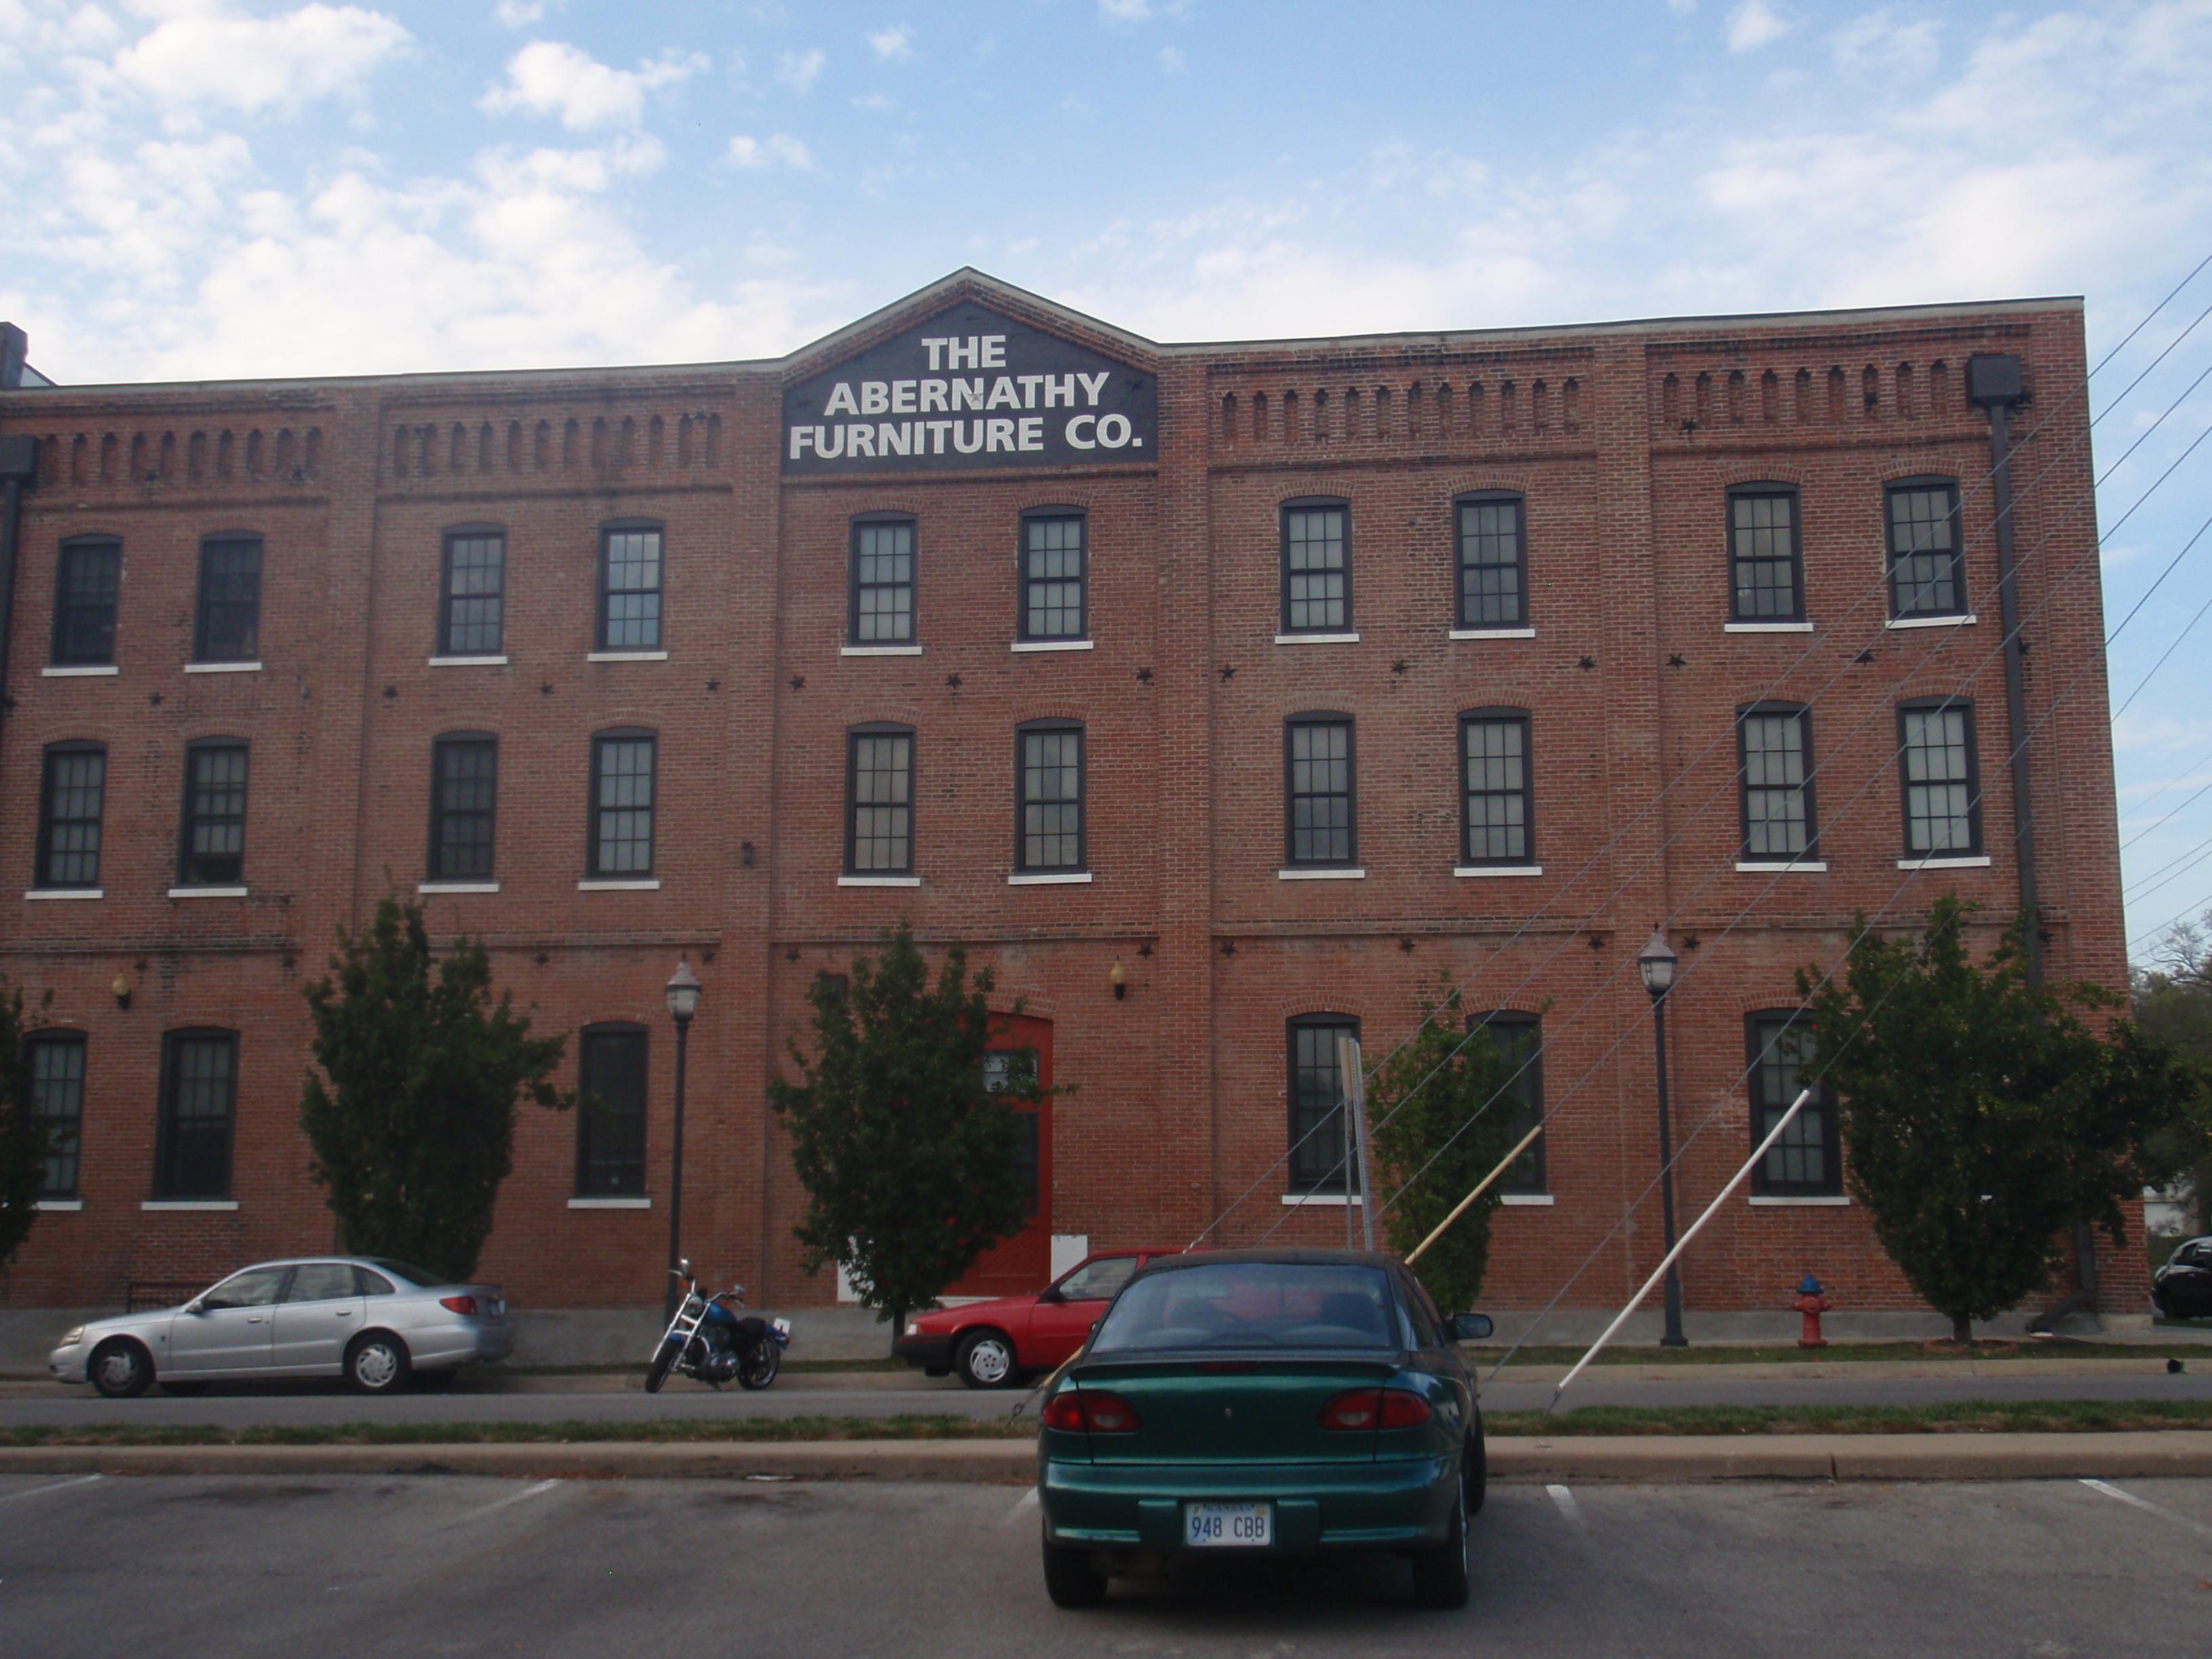 File:Abernathy Furniture Co (Leavenworth, Kansas) 1